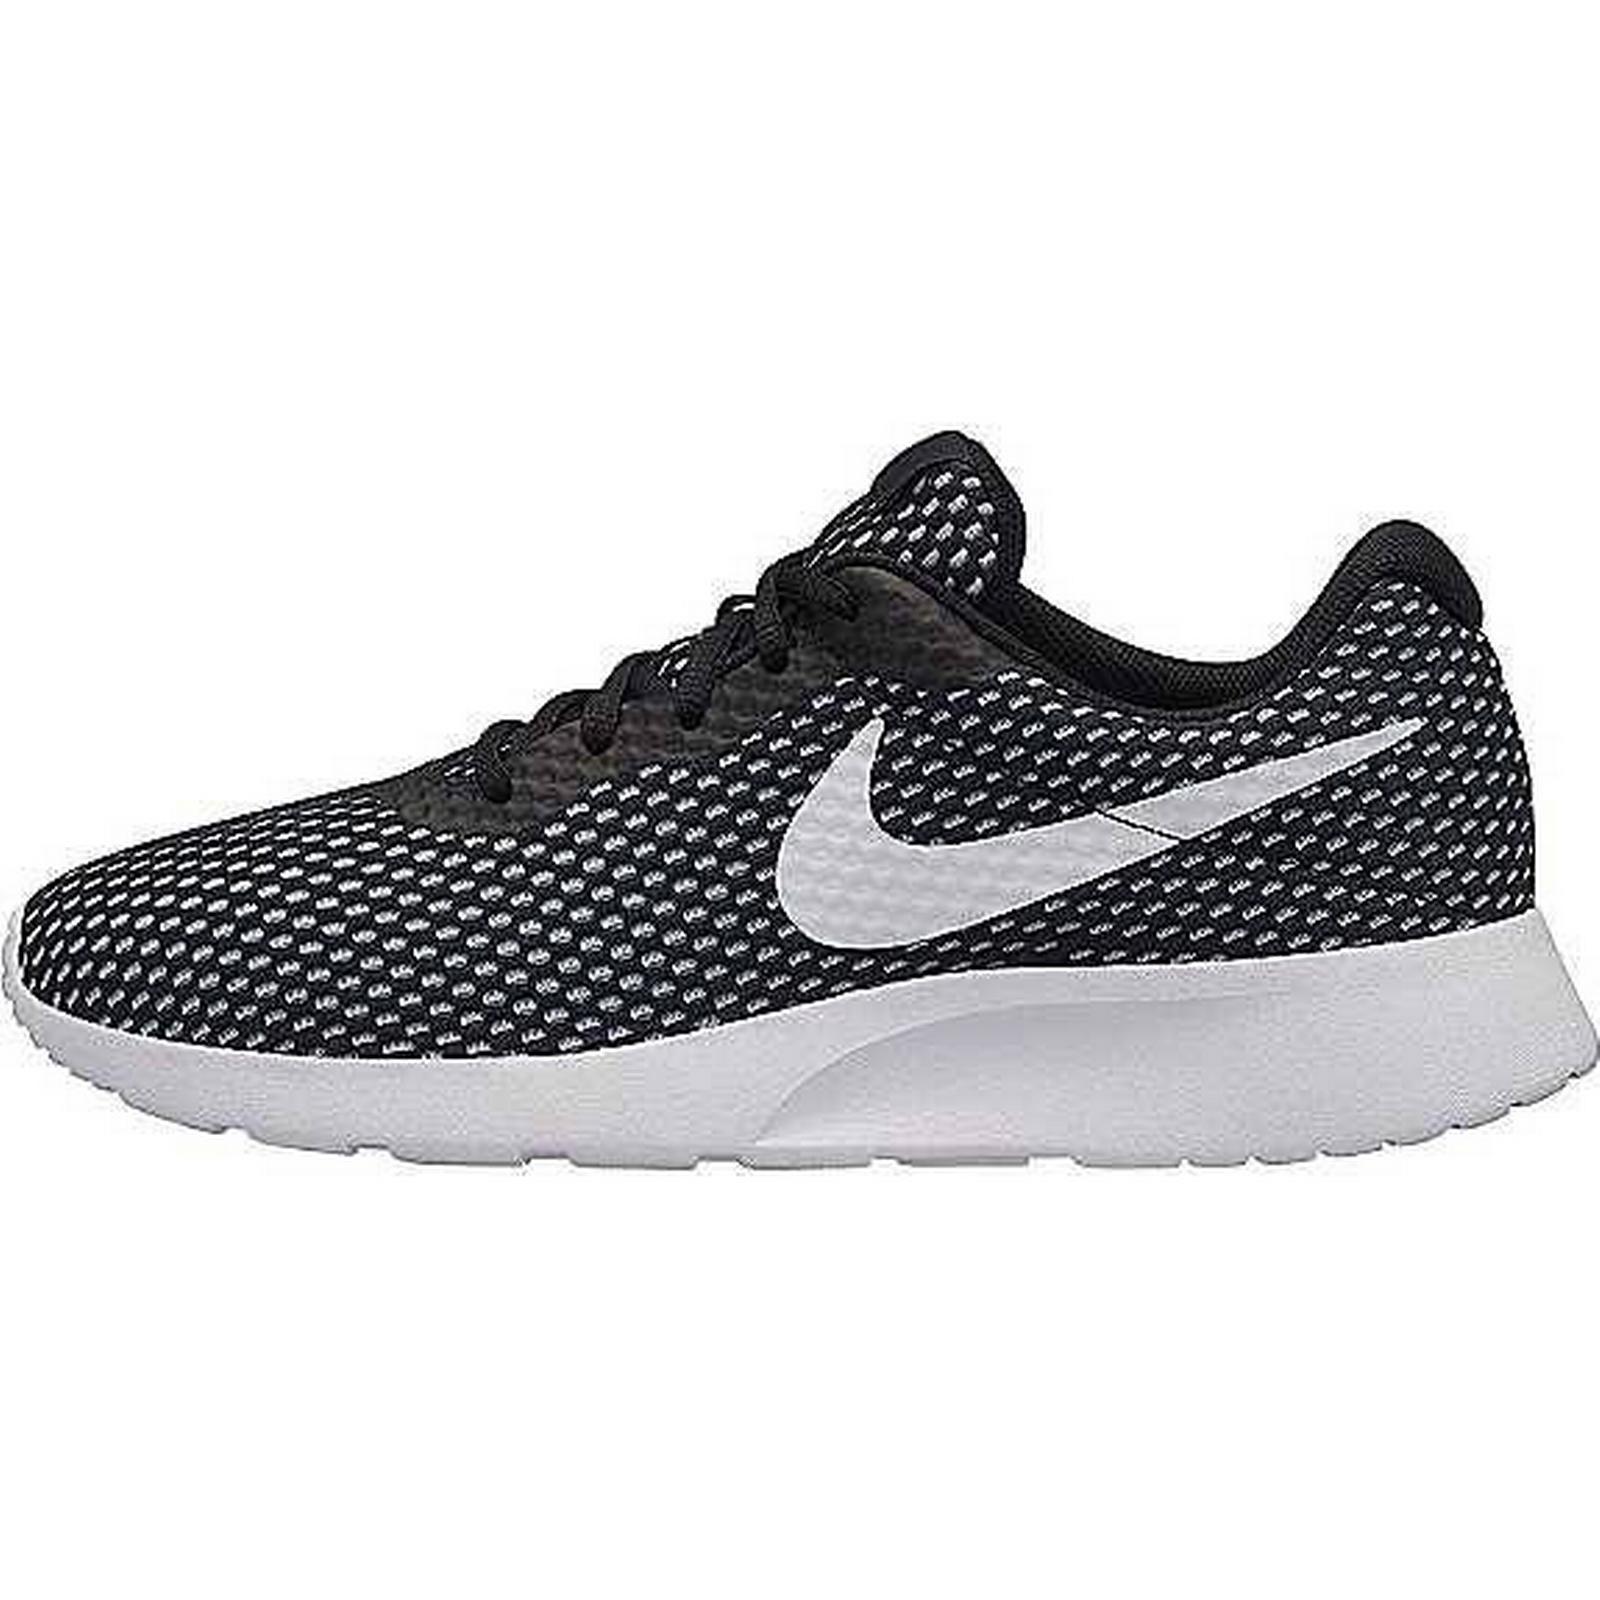 Nike Nike:Men's/Women's:Easy-To-Clean 'Tanjun SE' Trainers by Nike:Men's/Women's:Easy-To-Clean Nike Surface 990ad2